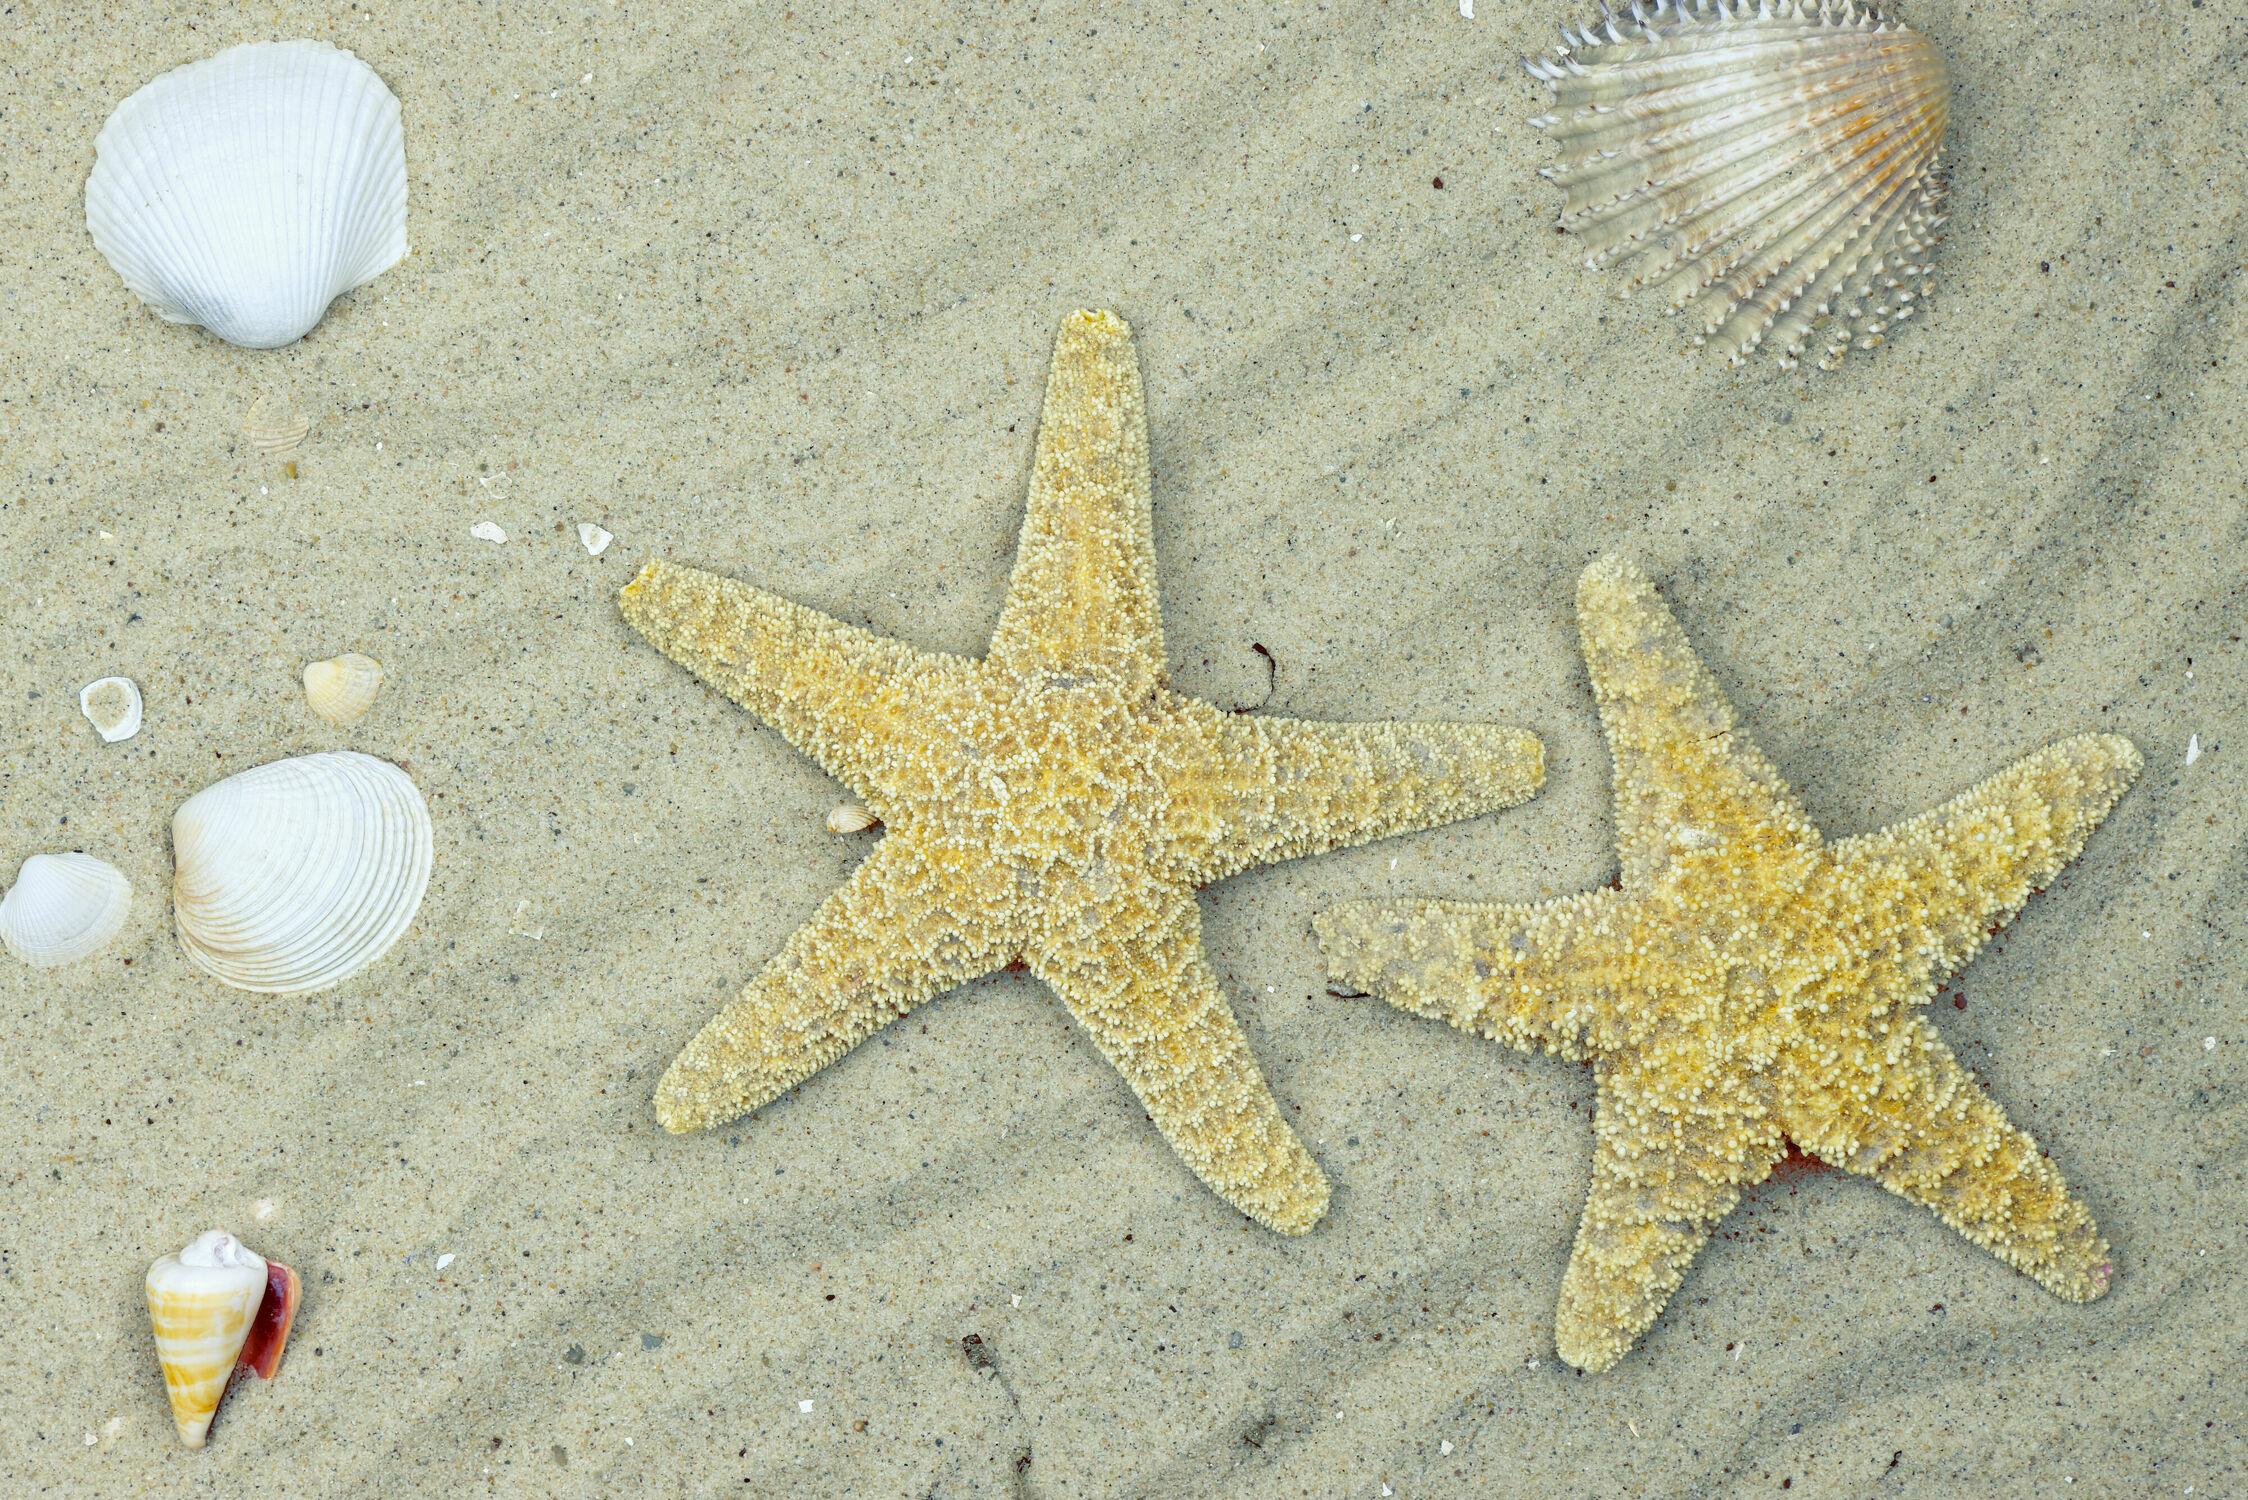 Bild mit Sand, Sandstrand, Strandbild, Muschel, Muscheln, Seestern, Seesterne, Wellness, Spa